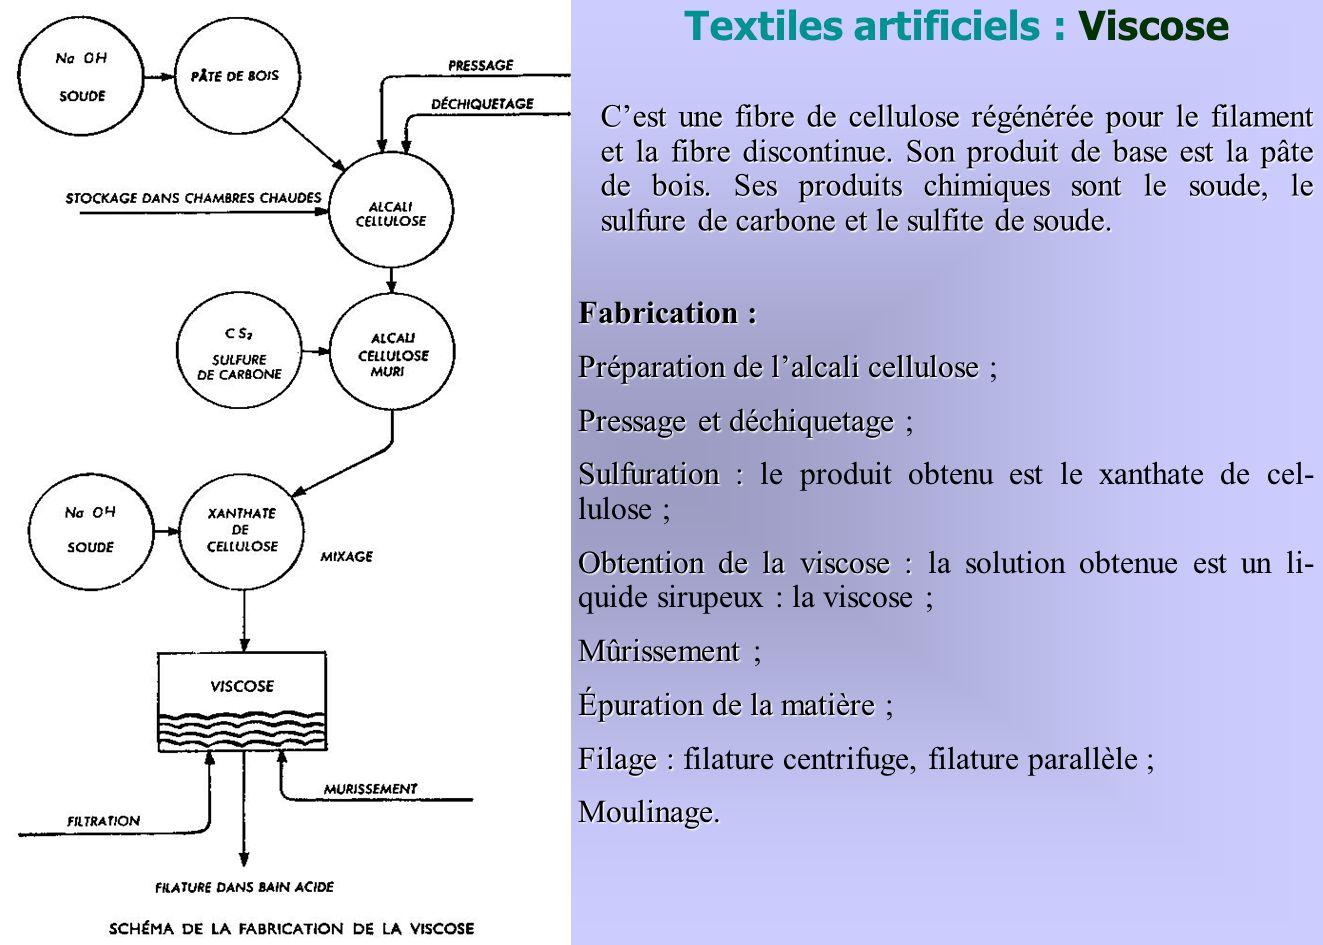 Textiles artificiels : Viscose Fabrication : Préparation de lalcali cellulose Préparation de lalcali cellulose ; Pressage et déchiquetage Pressage et